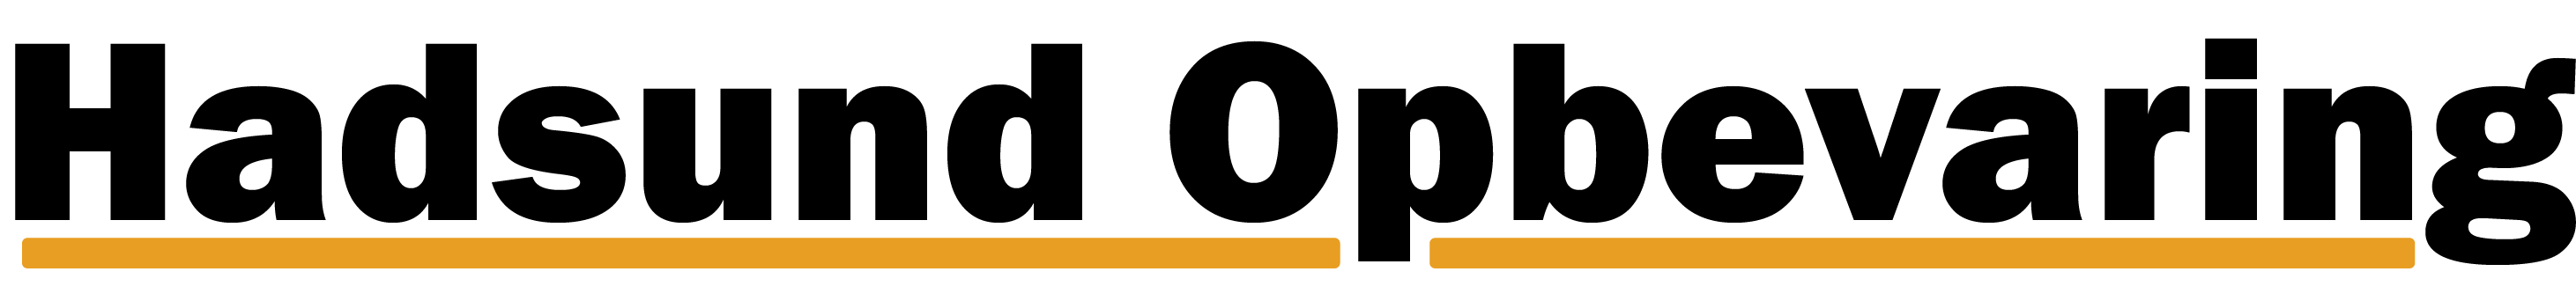 Hadsund Opbevaring logo